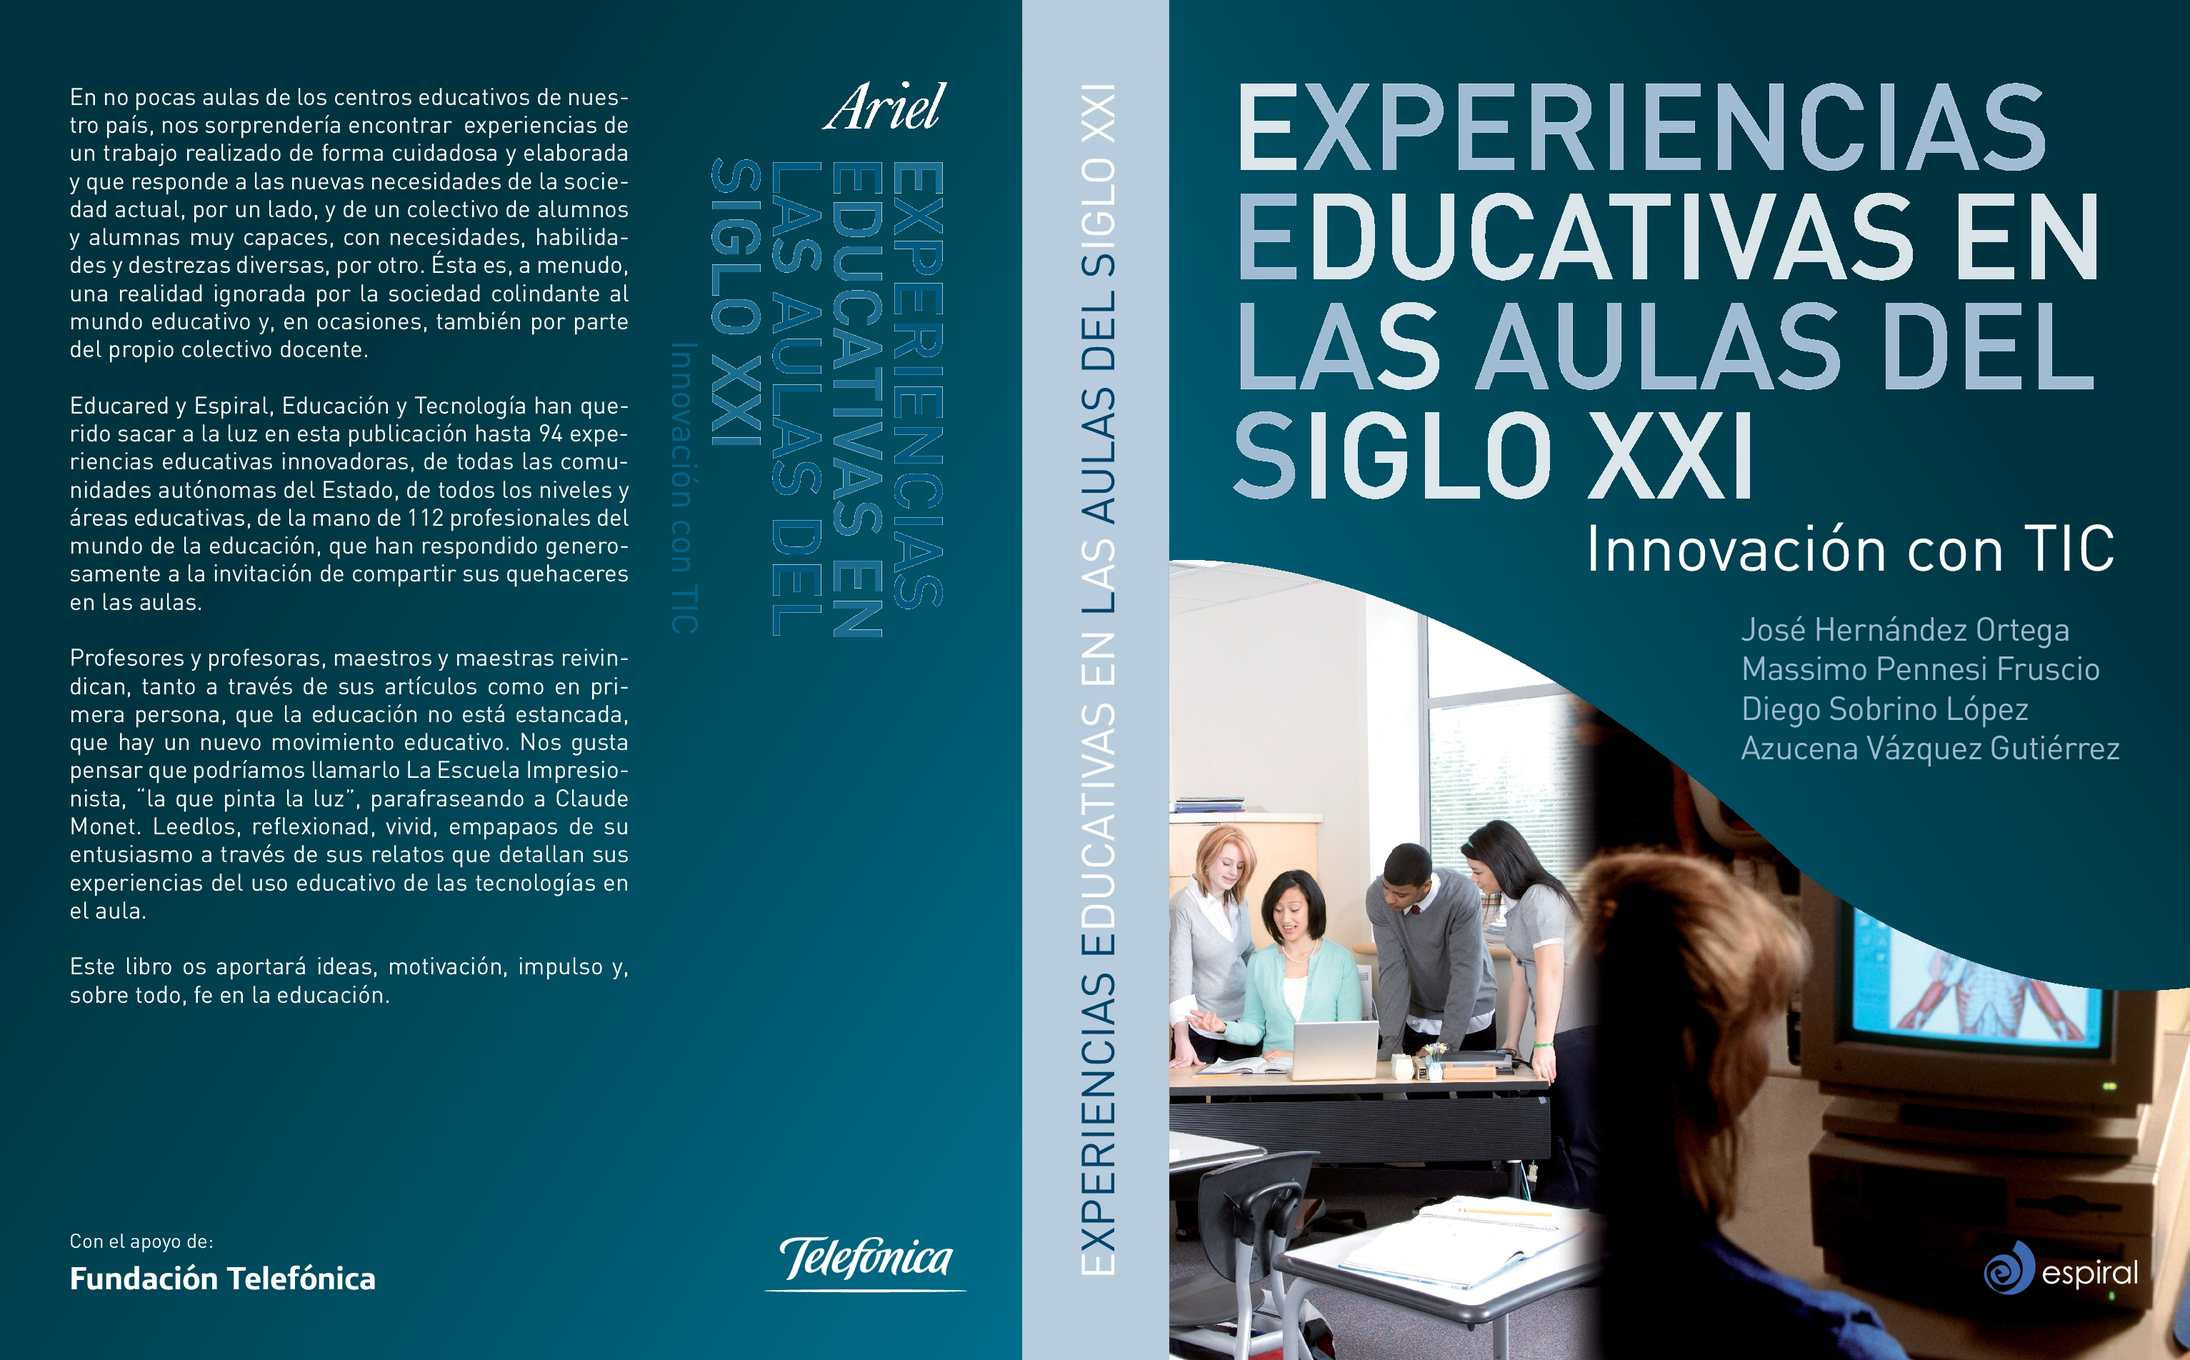 Calaméo - 225 Experiencias Educativas20 5f2702f5d03